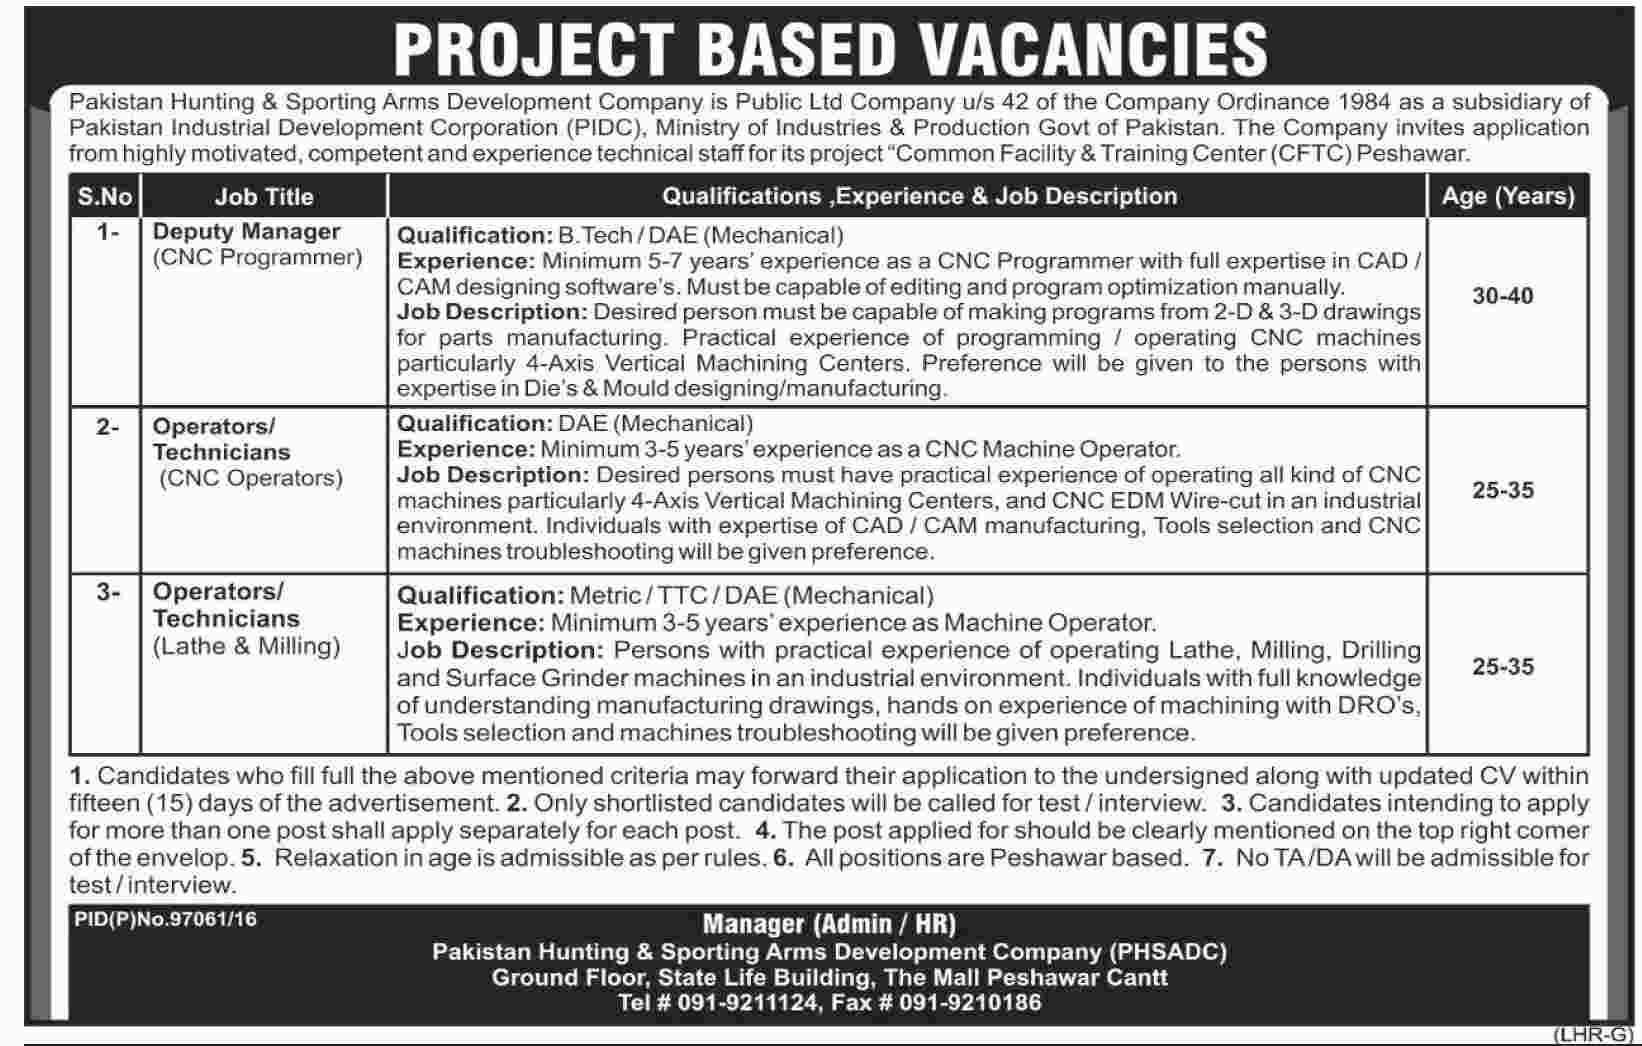 pakistan hunting sporting arms development company phsadc jobs deputy manager operators technicians